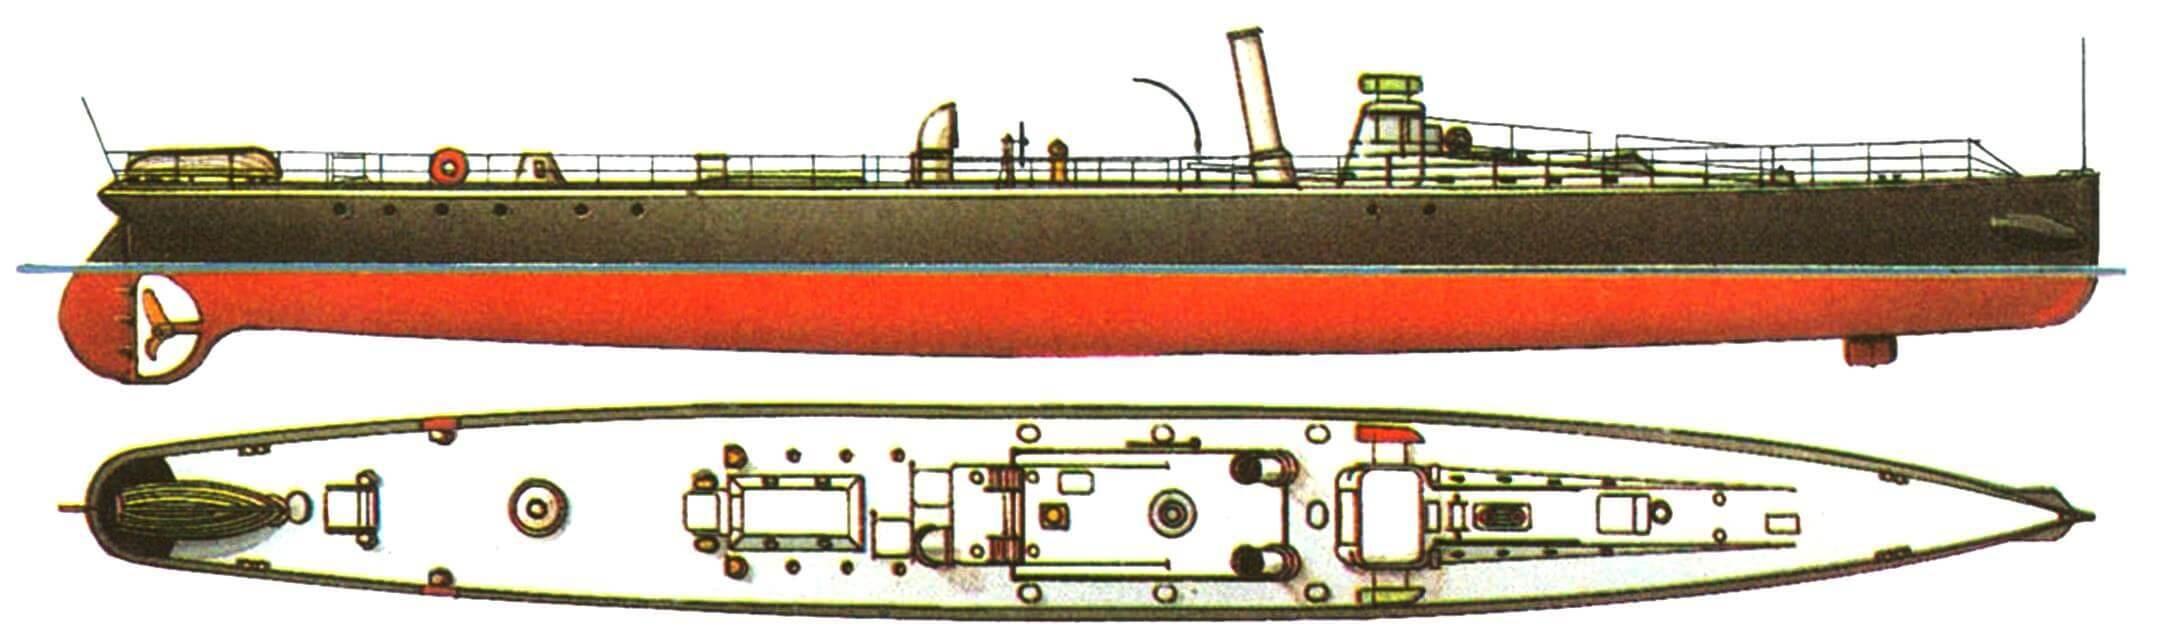 34. Миноносец «Мунин», Швеция, 1888 г.